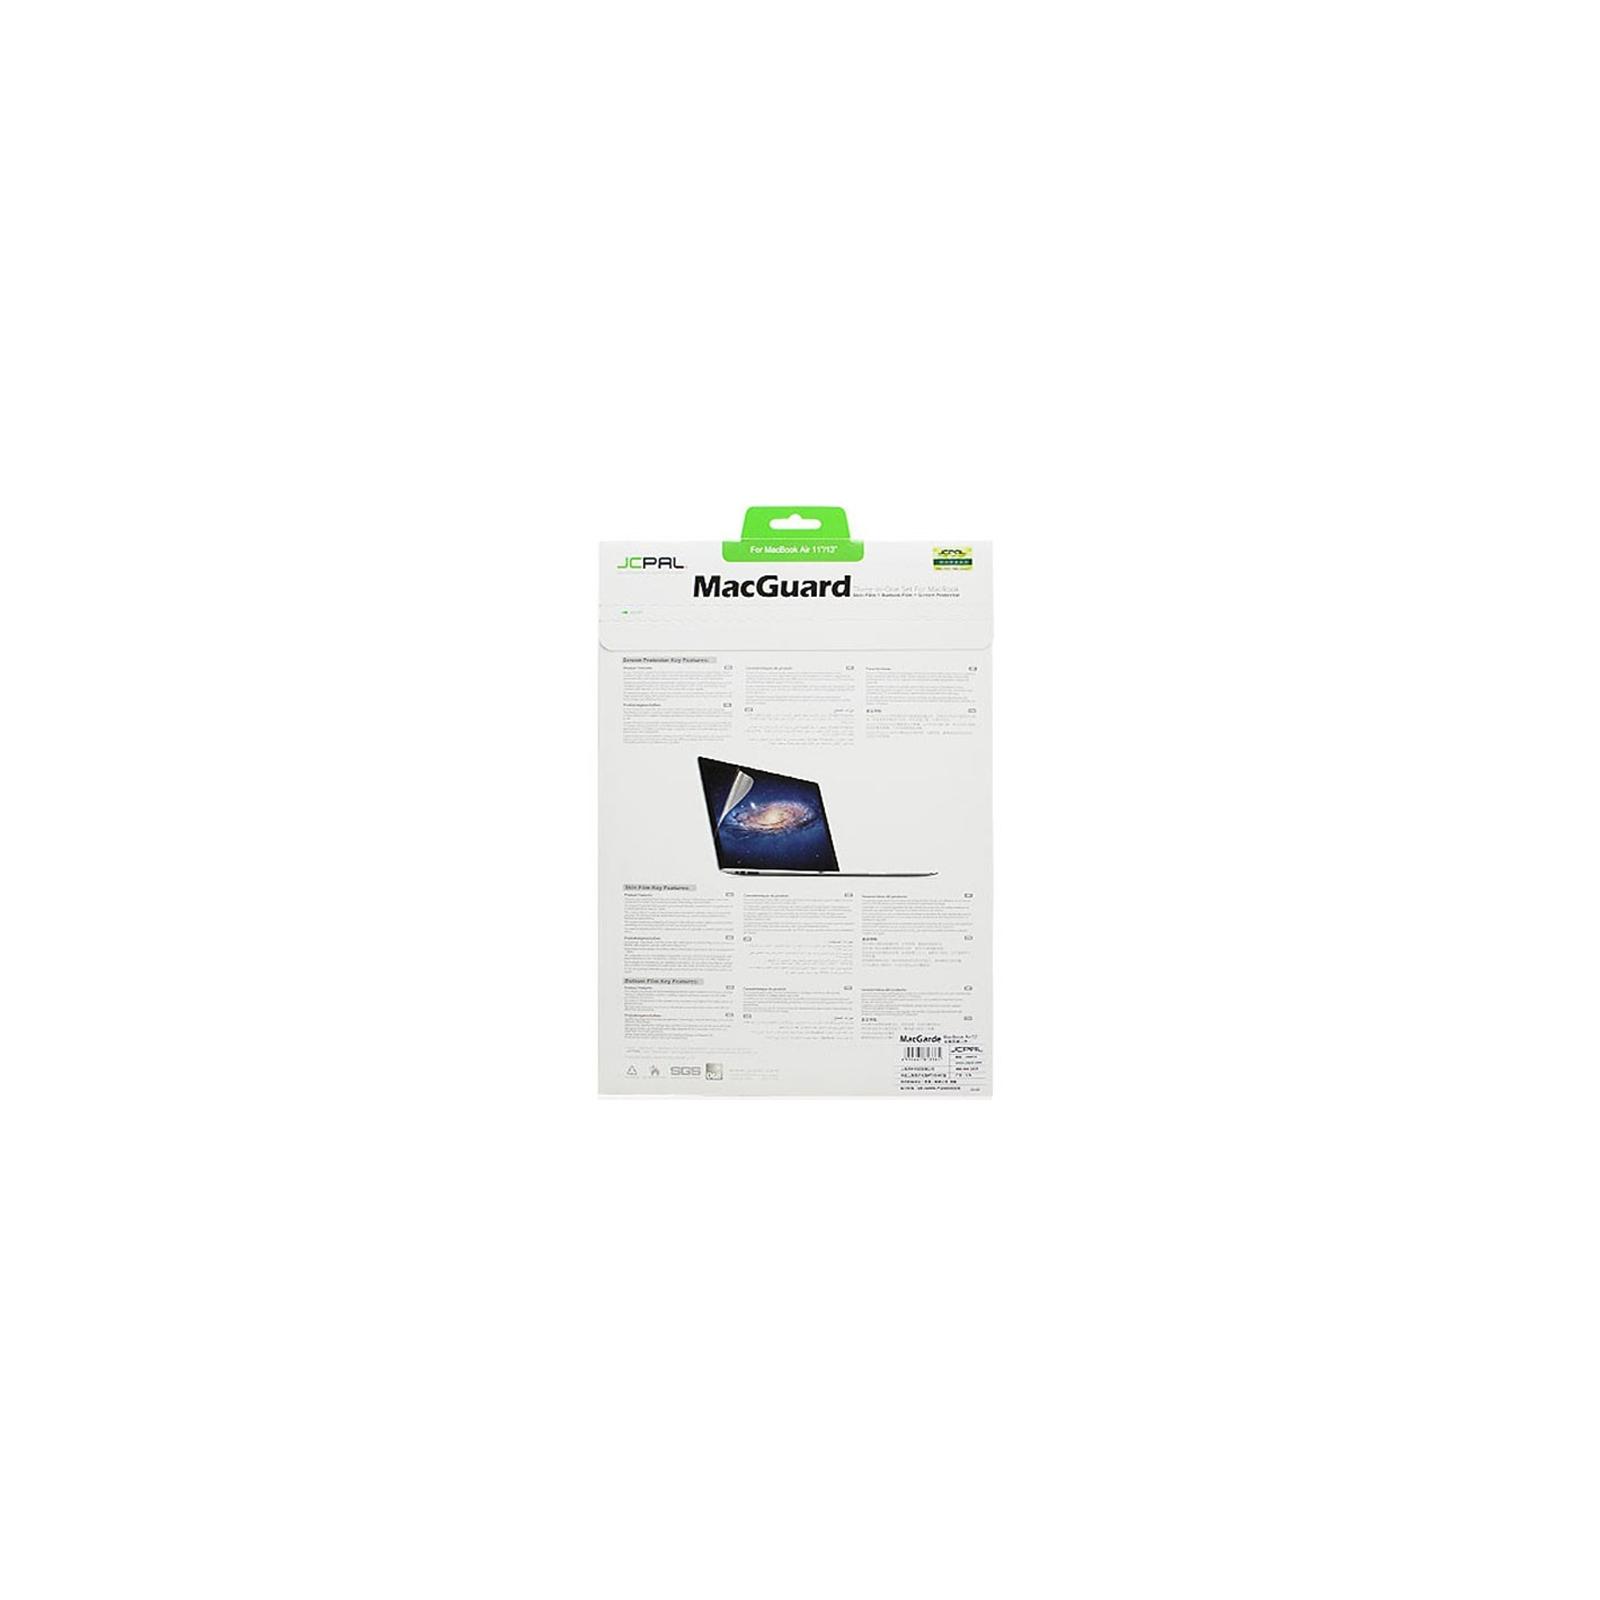 Пленка защитная JCPAL 3 in 1 set для MacBook Air 13 (JCP2044) изображение 2